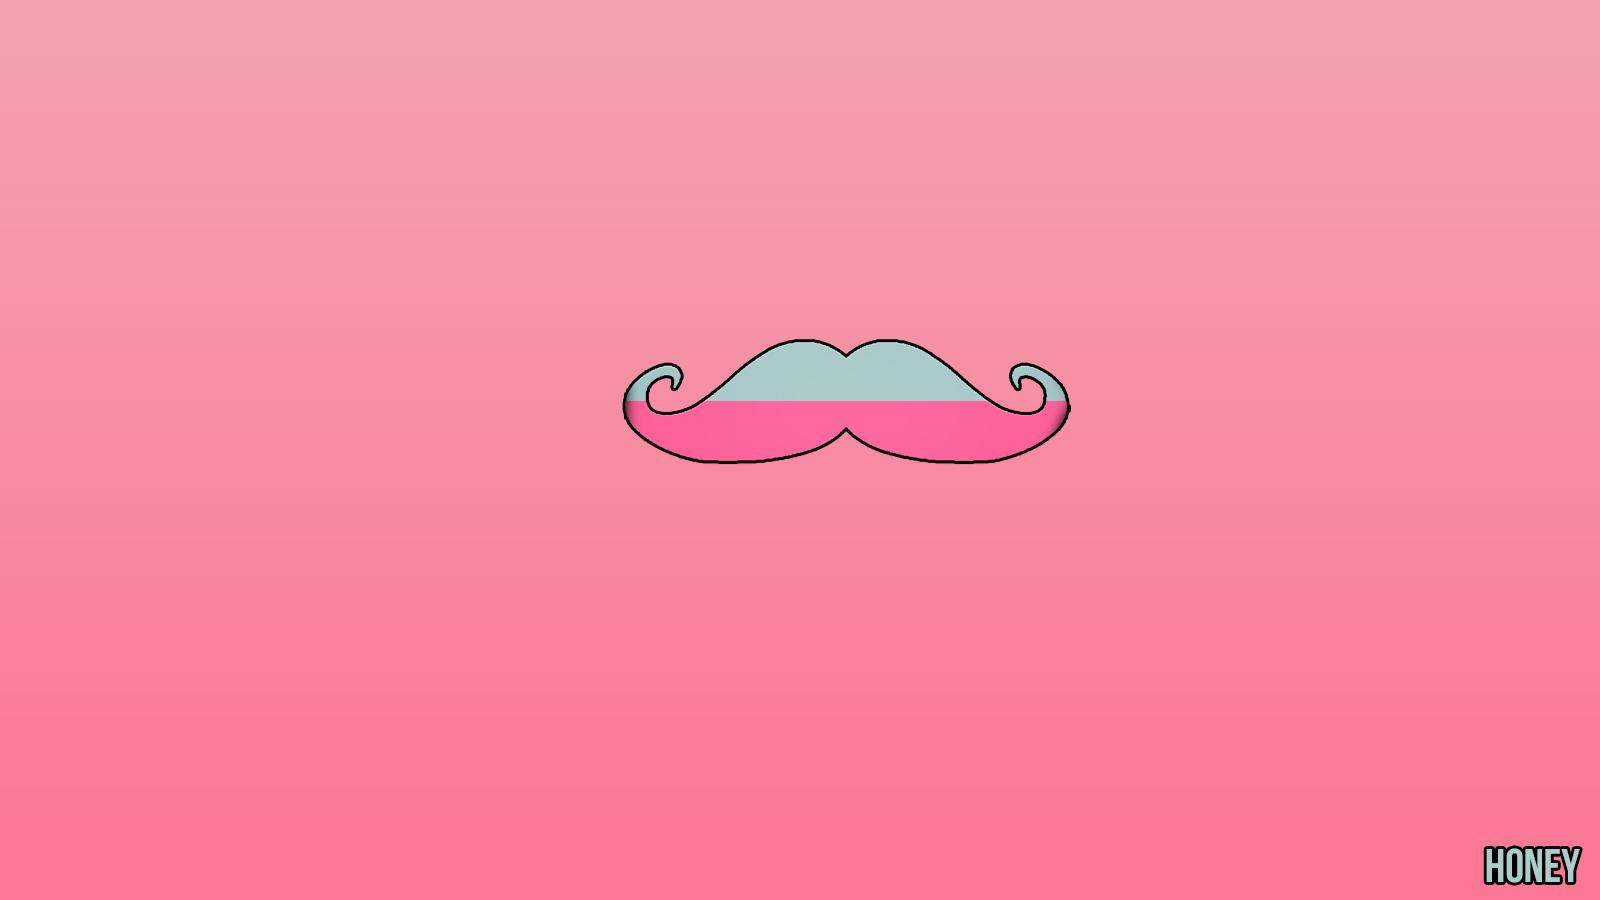 Mustache Wallpaper For Desktop WallpaperSafari